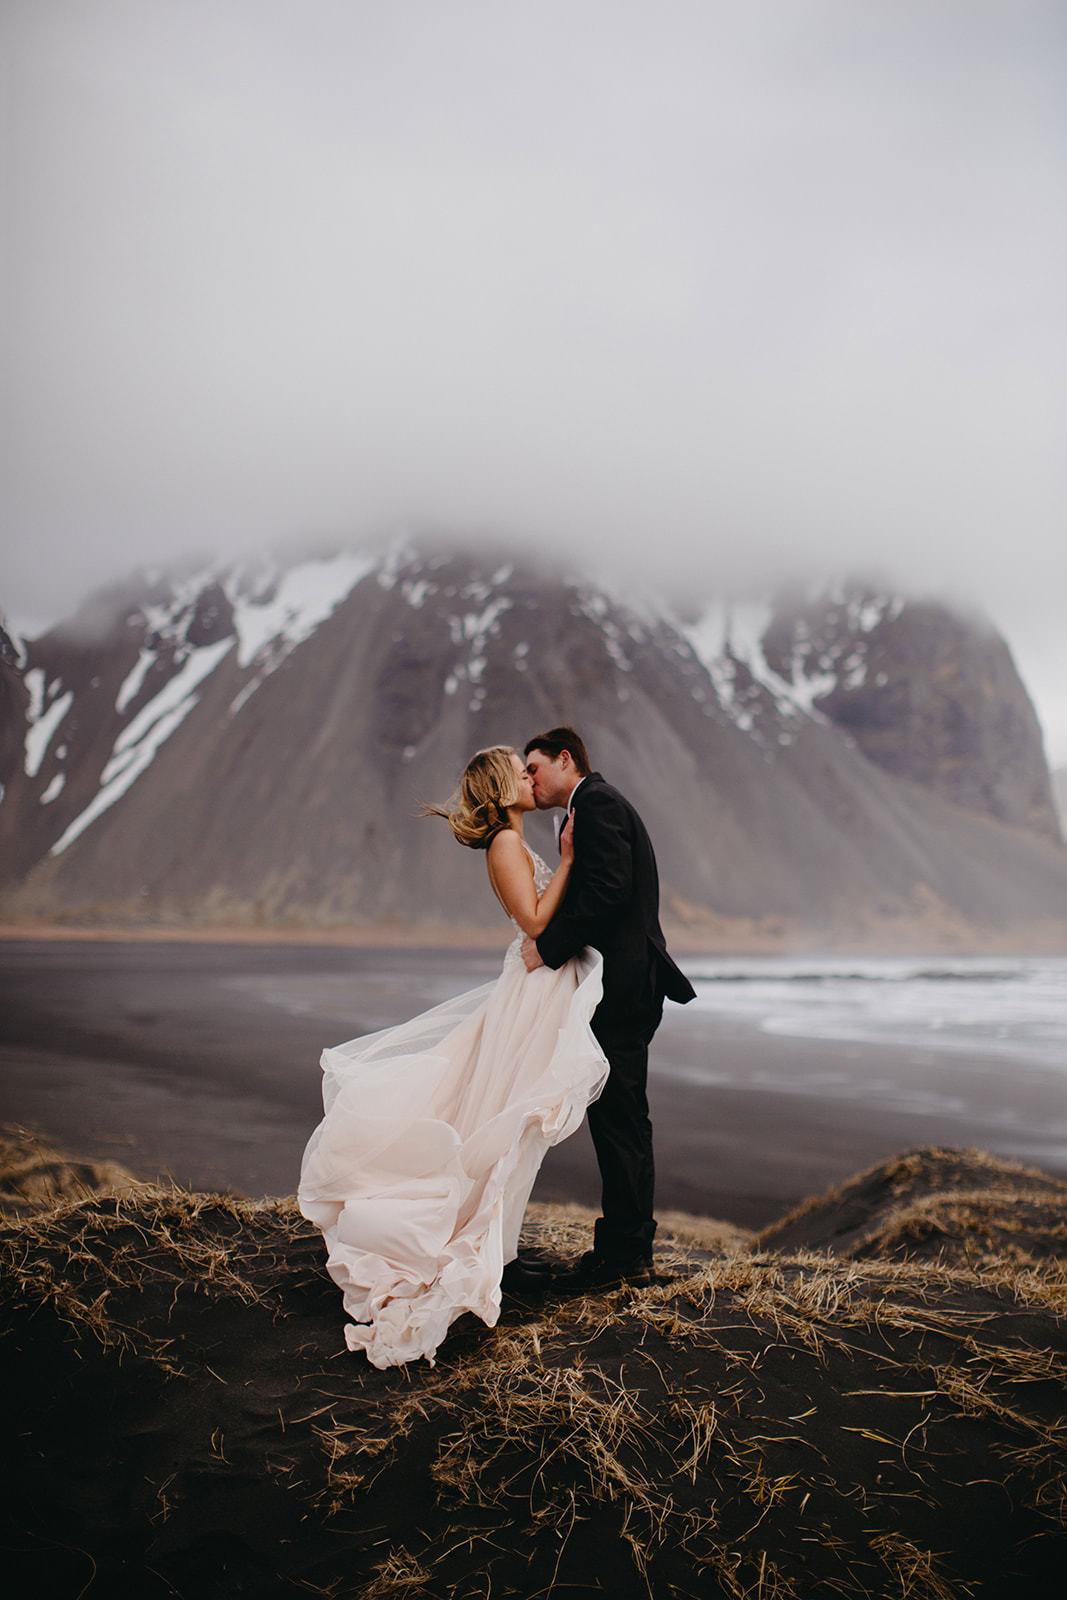 Icelandic Iceland Elopement Wedding Elope Photographer Eloping Reykjavík Vik Black Sand Beach Jökulsárlón Skogafoss Waterfall Vestrahorn Mountain Liz Osban Photography Destination 30.jpg